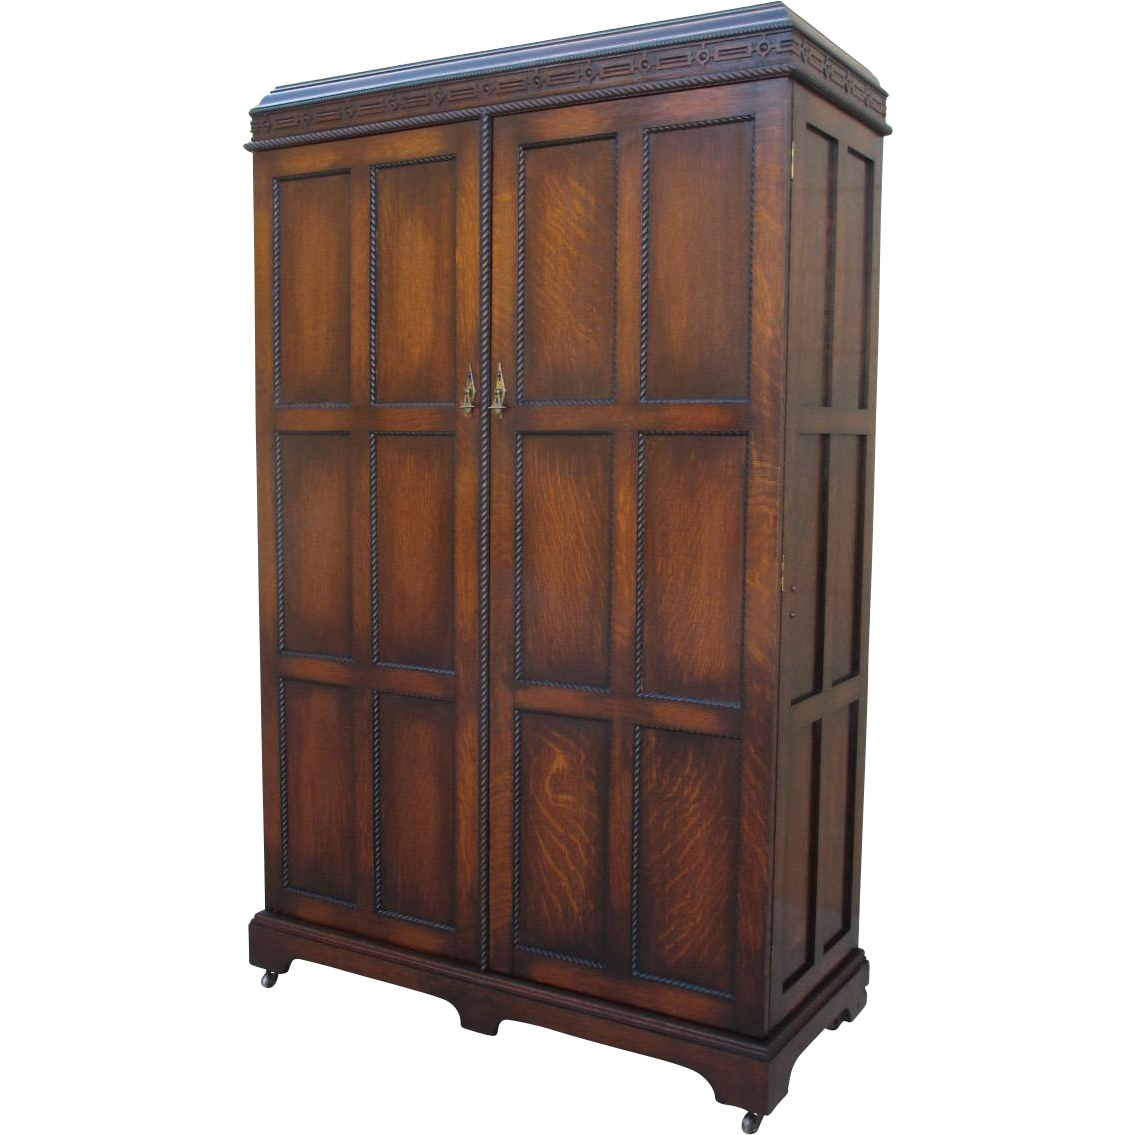 english antique oak armoire gentlemens wardrobe with built in drawers antique english wardrobe armoire